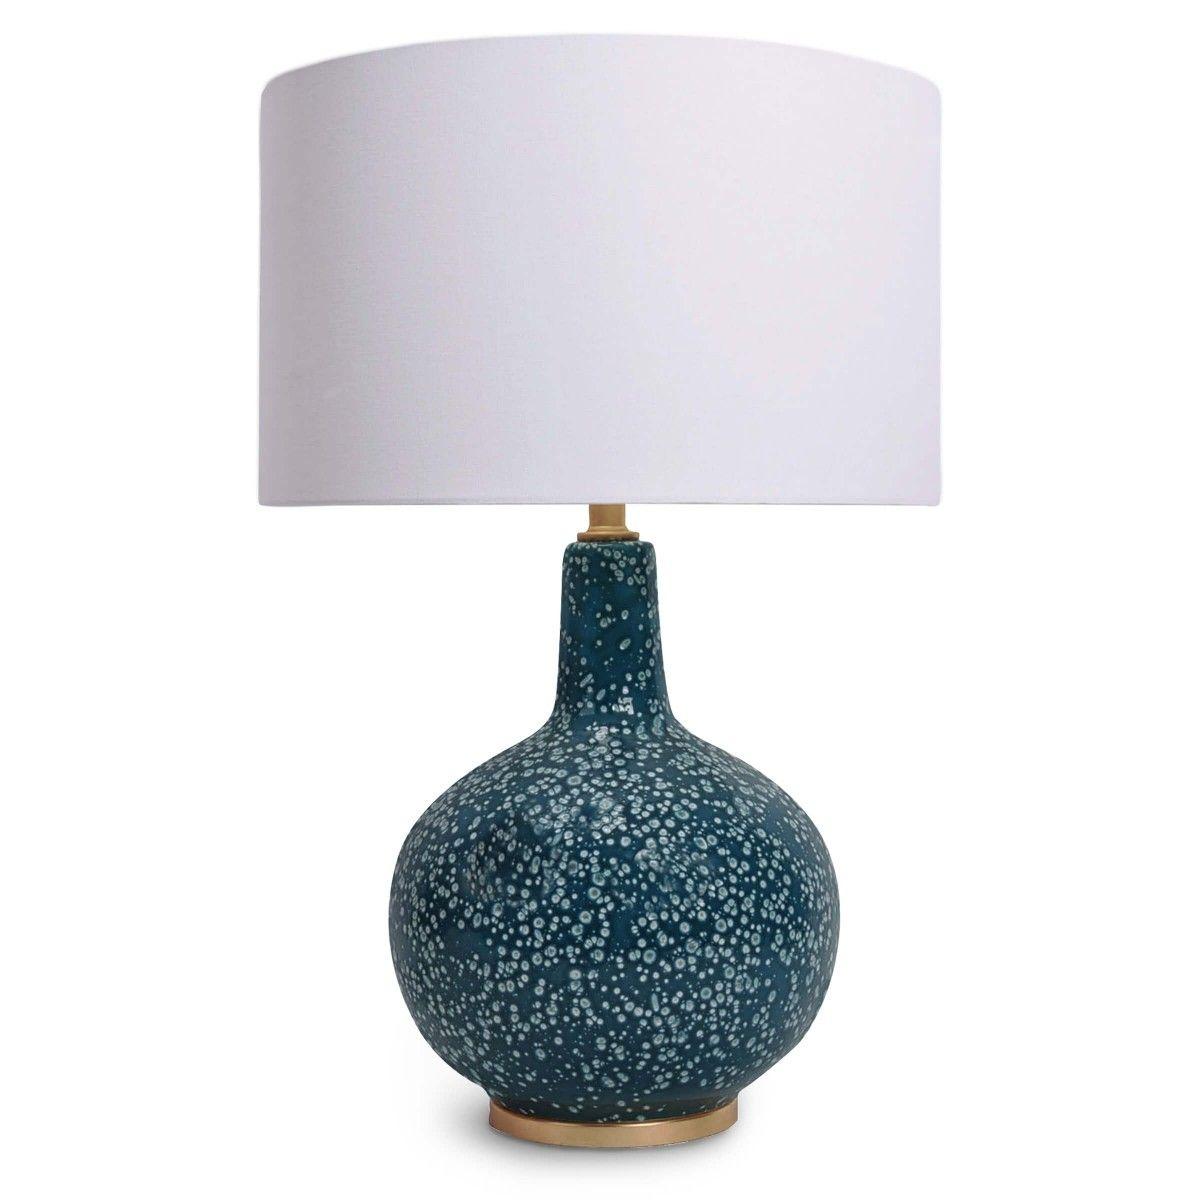 hight resolution of bulb qty 1 socket e26 3 way cast turn knob wiring type standard material ceramic finish blue